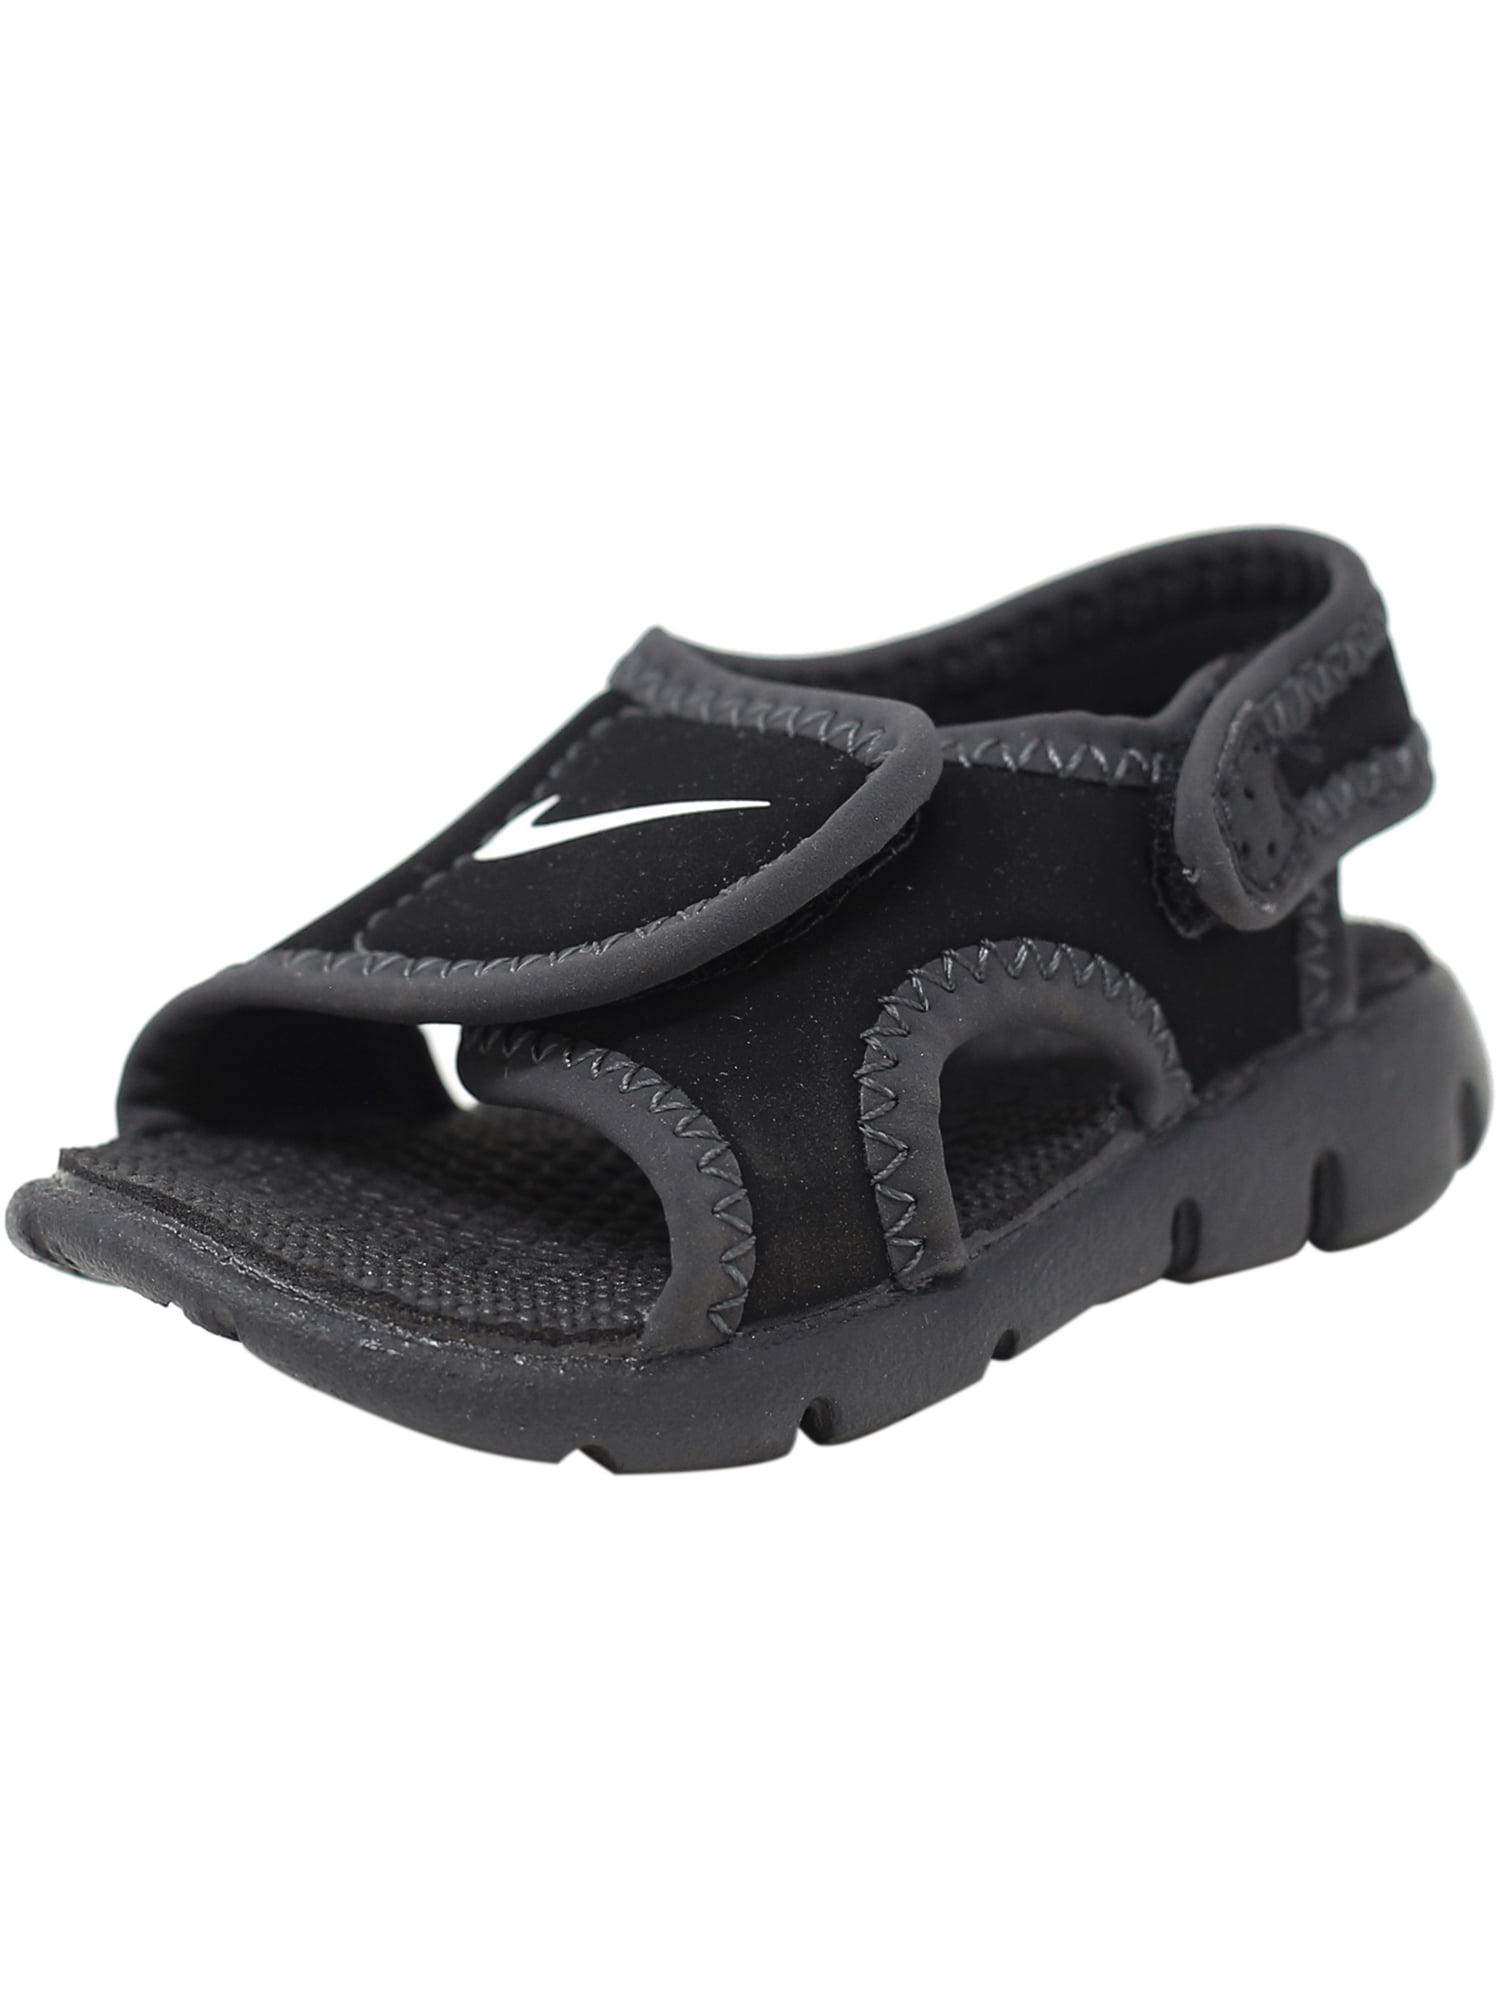 75d4a9ac1ae6 Nike Sunray Adjust 4 Black   White - Anthracite Sandal 4M